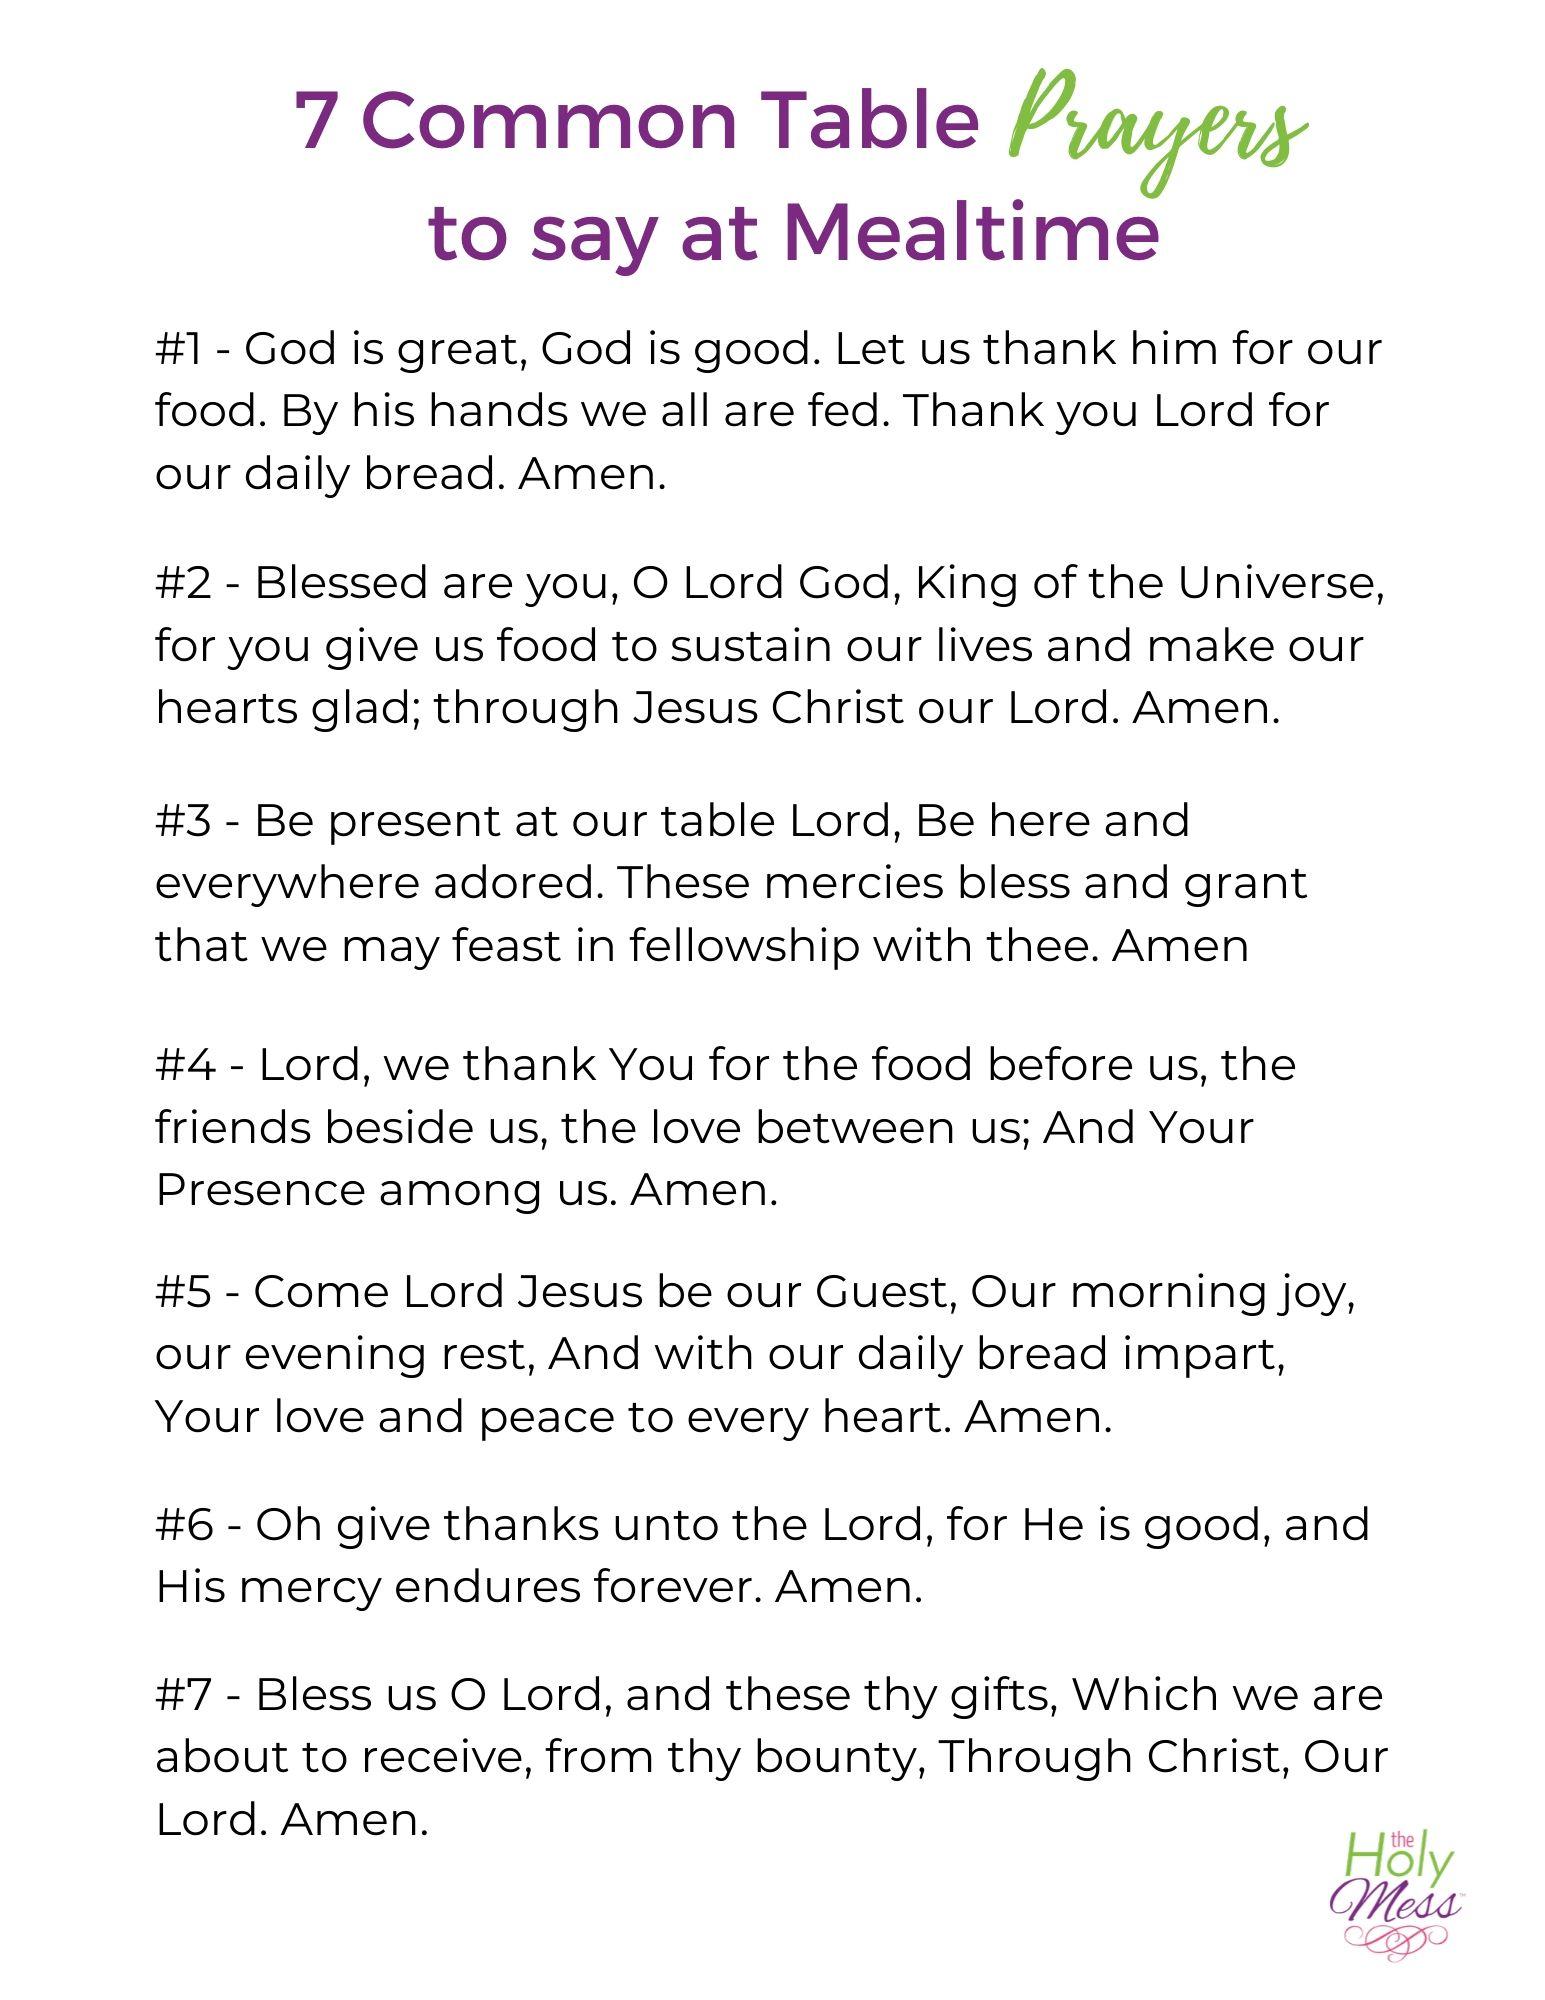 Common Table Prayers - Free Printable